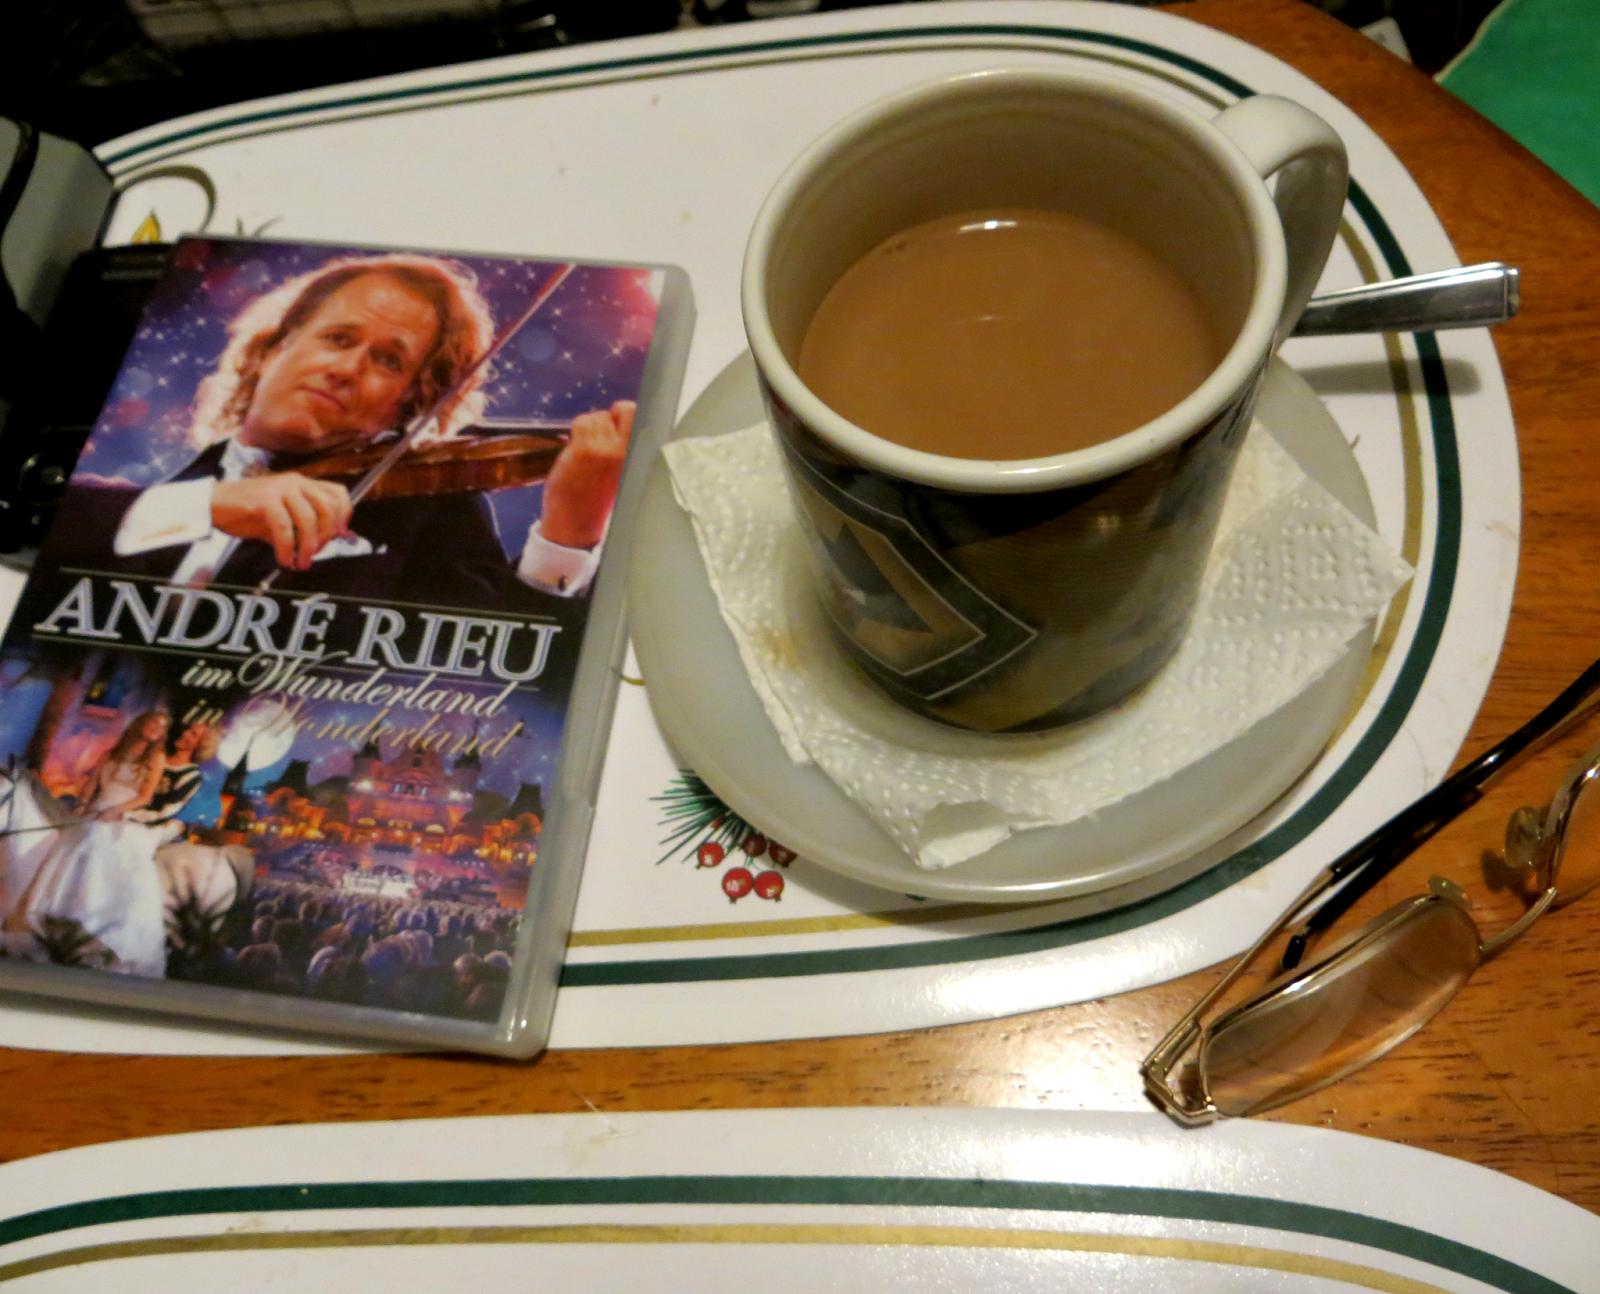 Andre Rieu and Tea